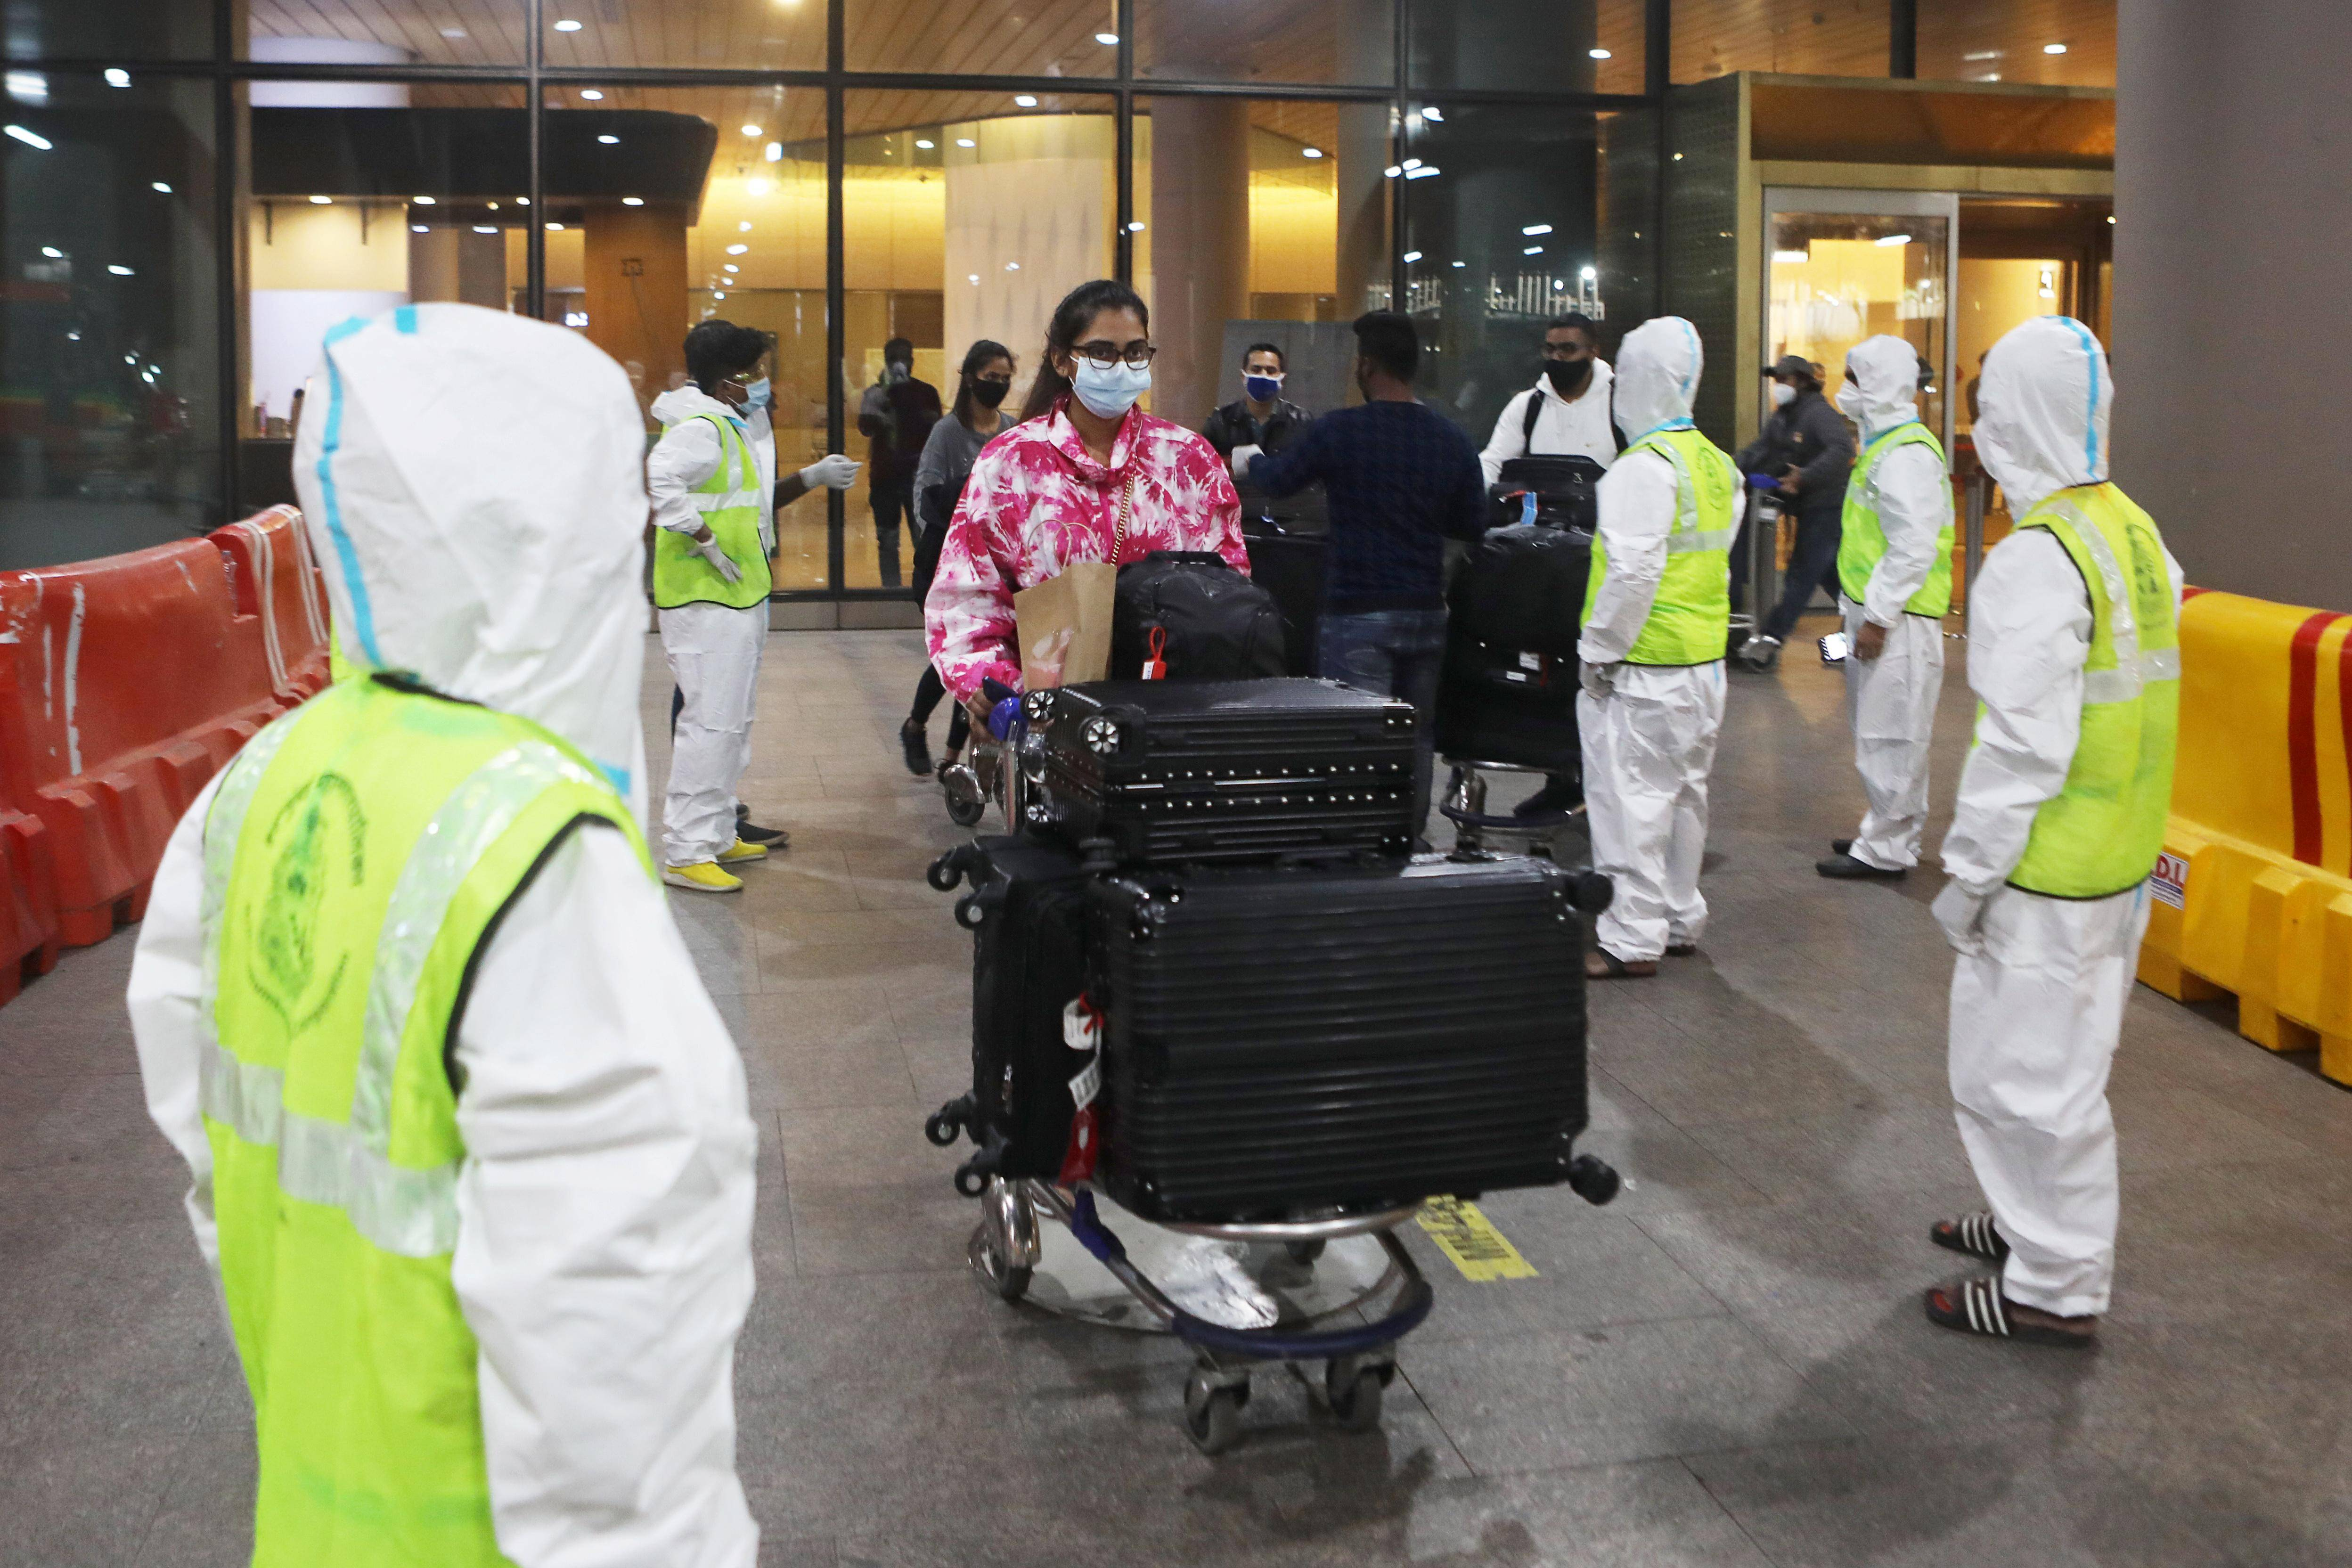 Coronavirus: India extends Covid-19 restrictions